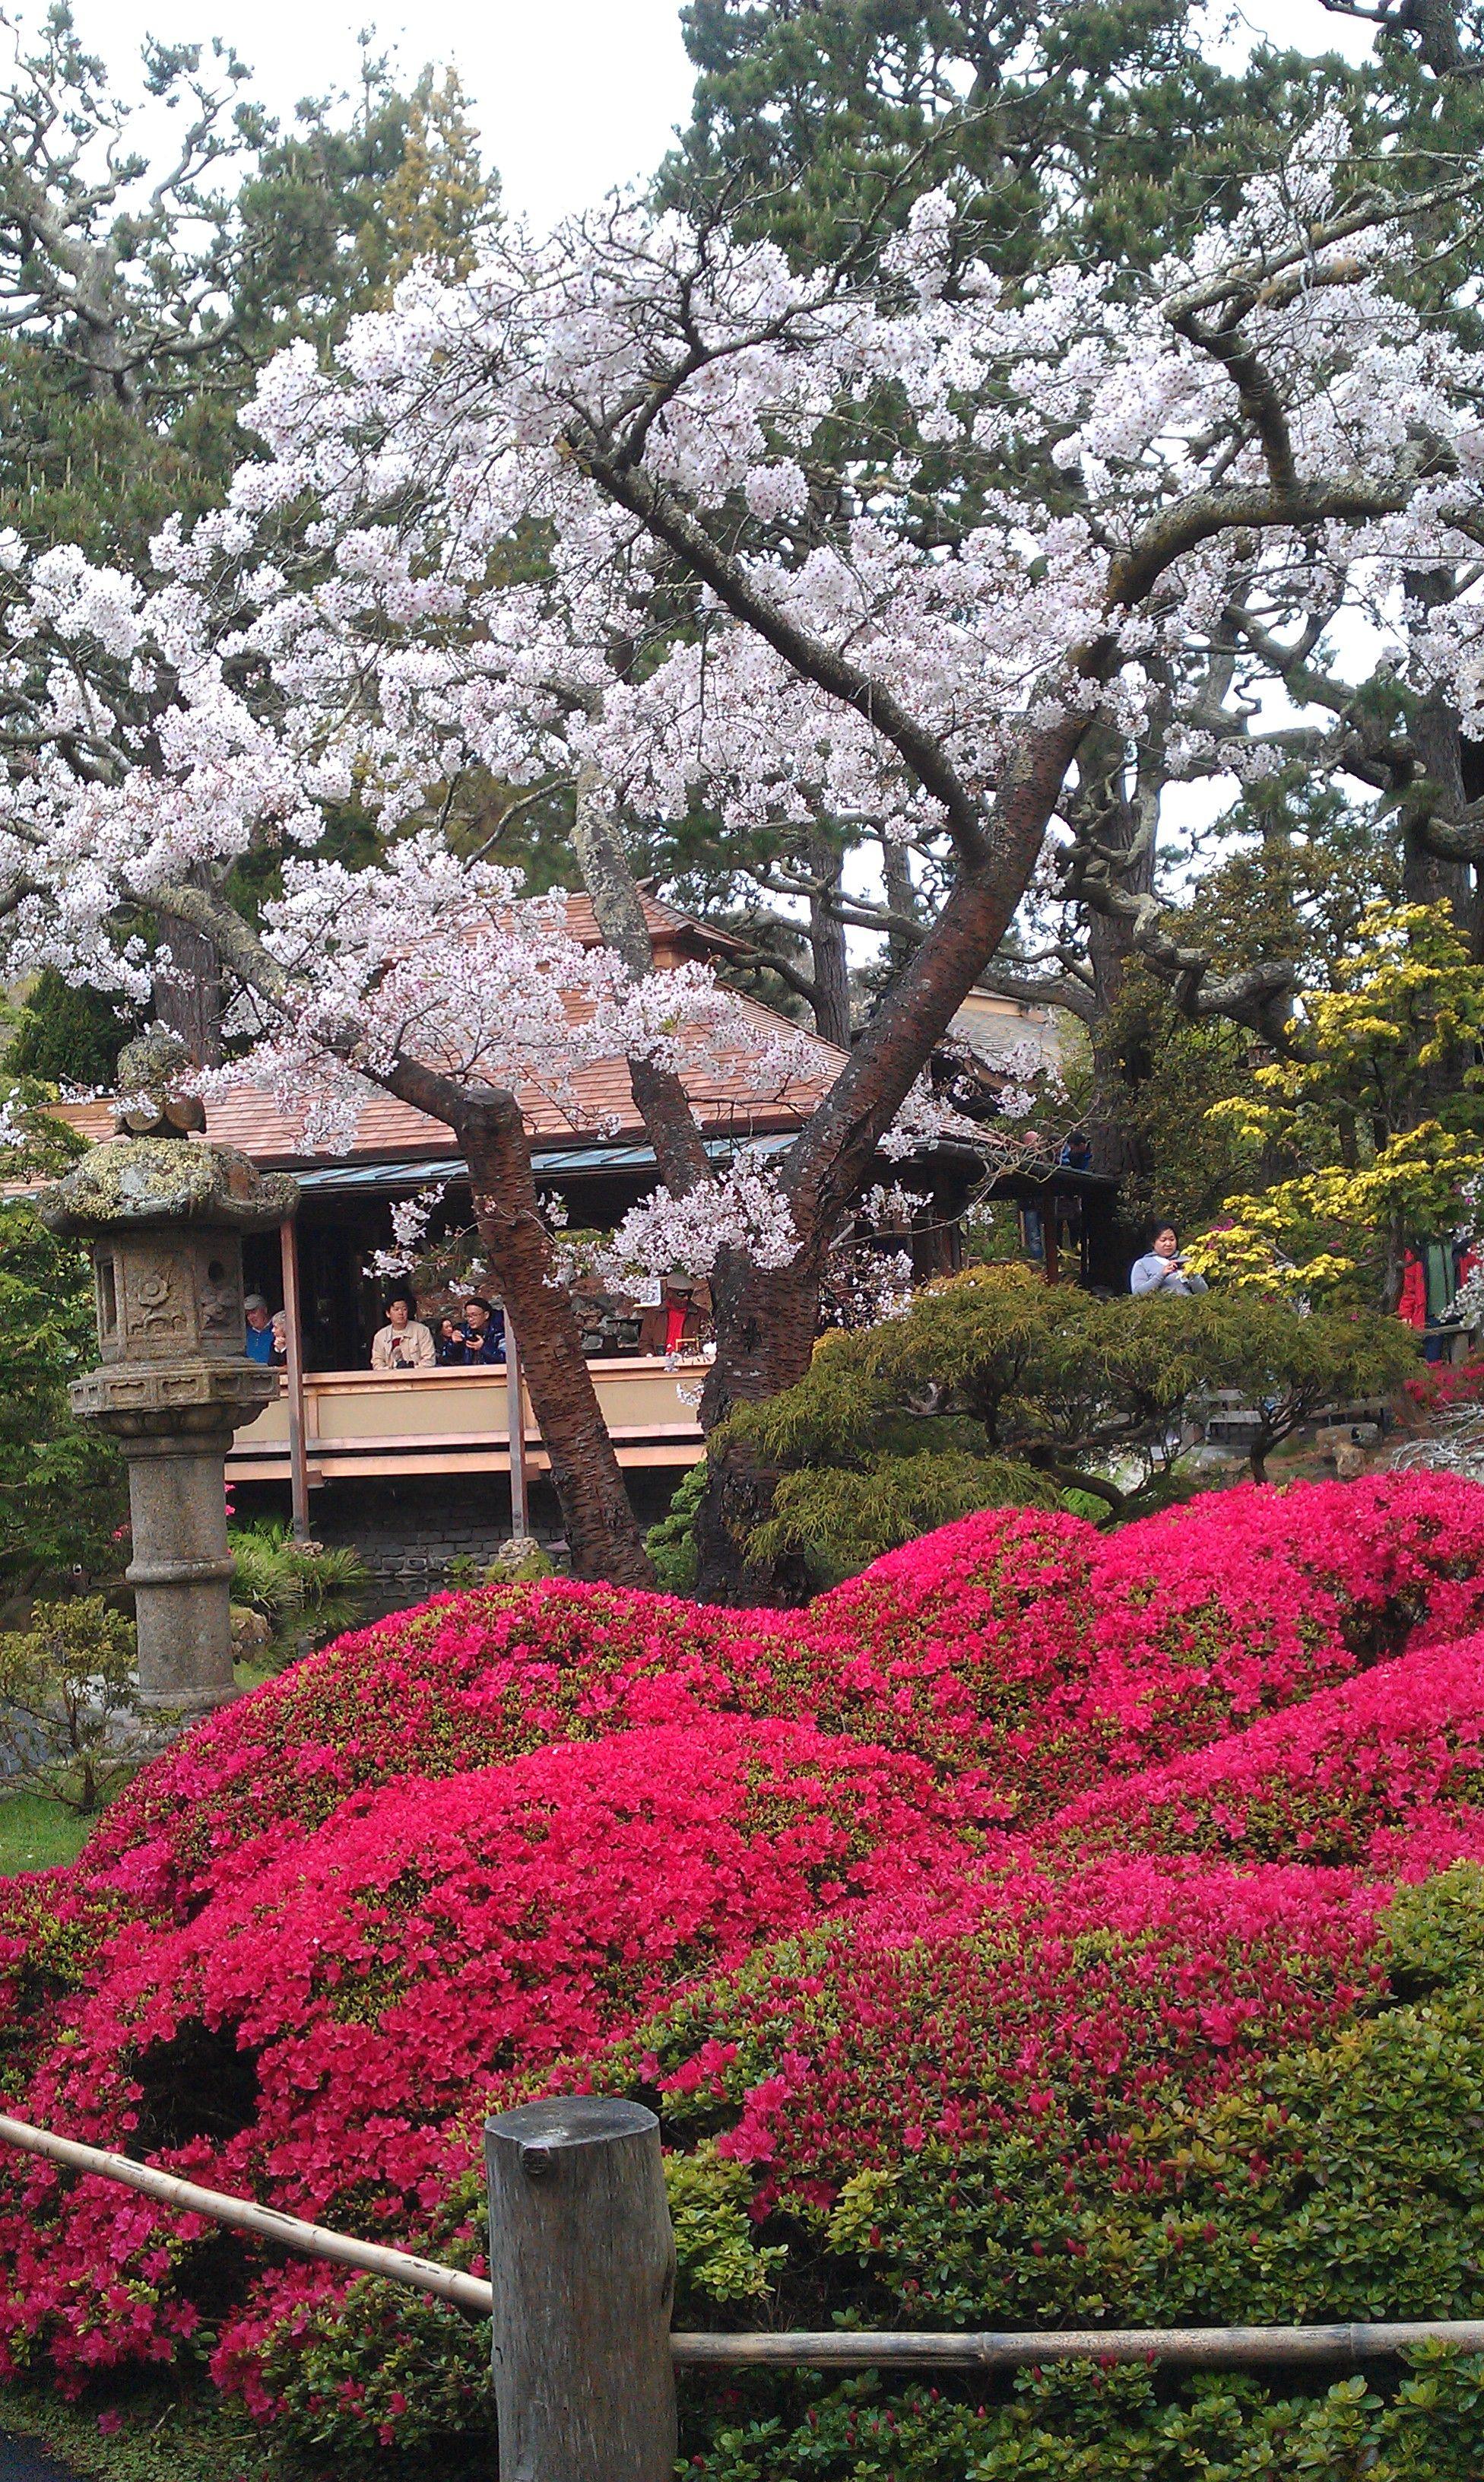 Cherry Blossoms In Bloom At Japanese Tea Garden In Golden Gate Park Beautiful Gardens Japan Garden Japanese Garden